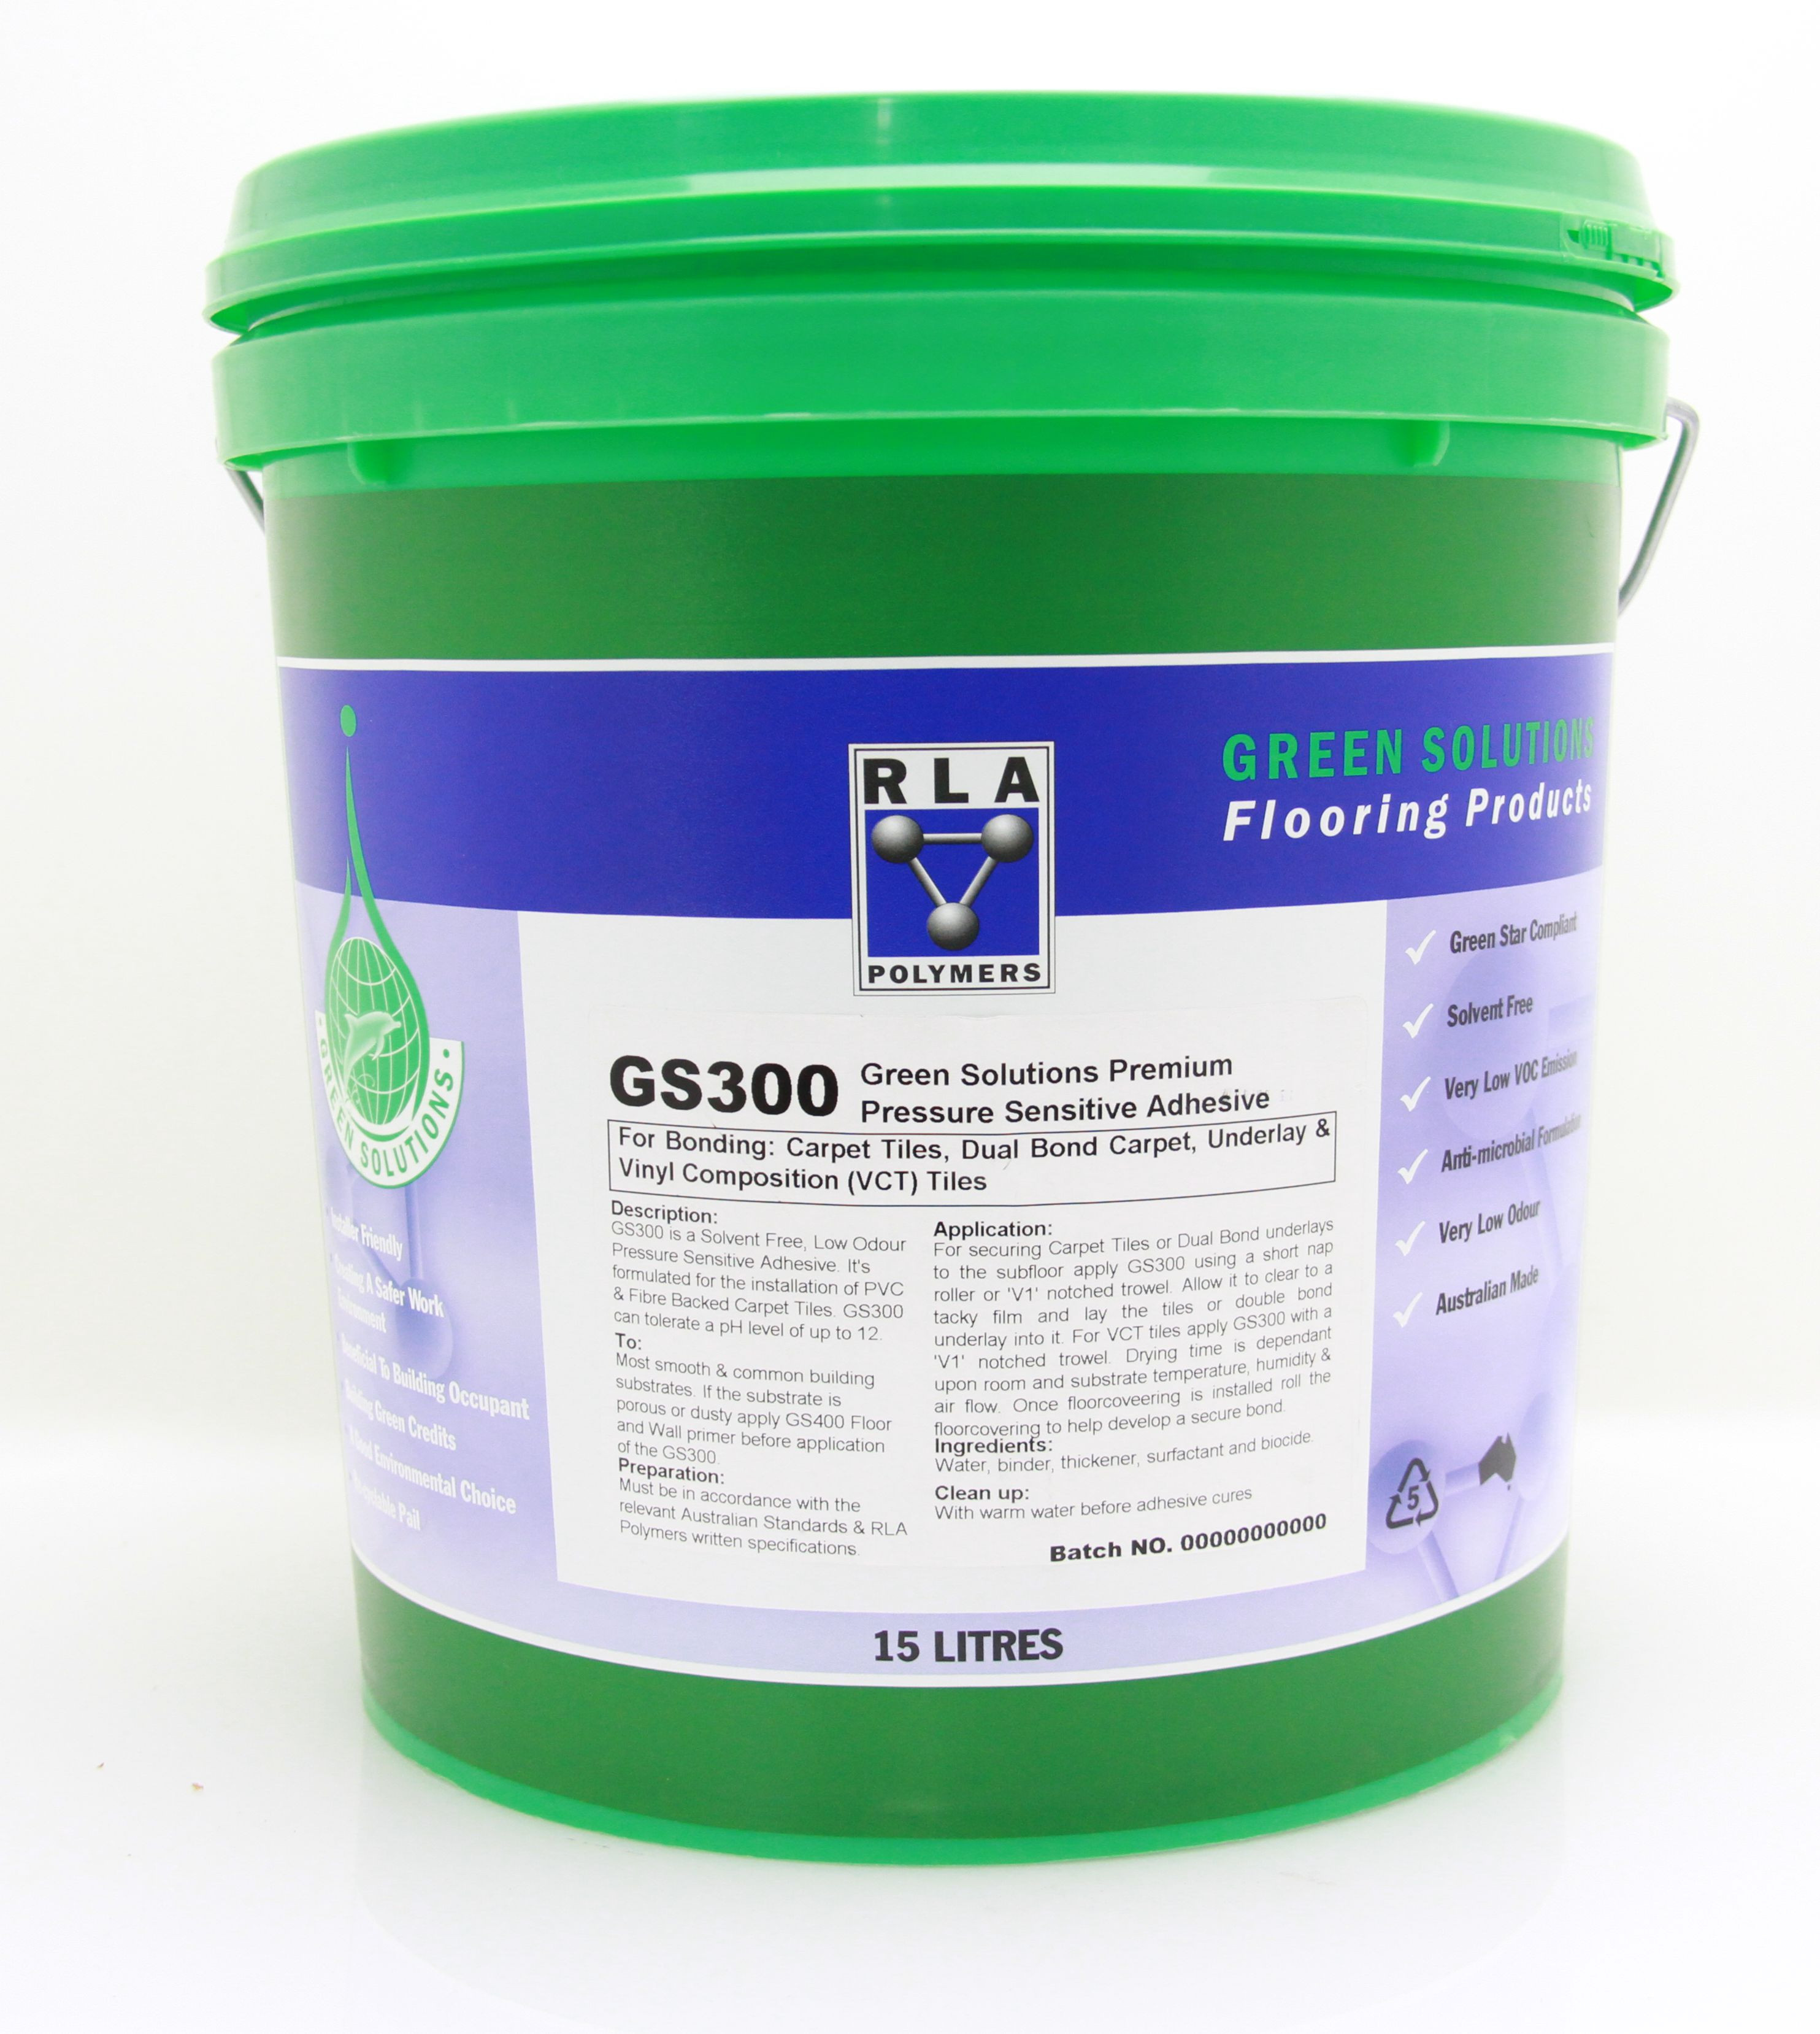 GS300 Commercial Pressure Sensitive Adhesive